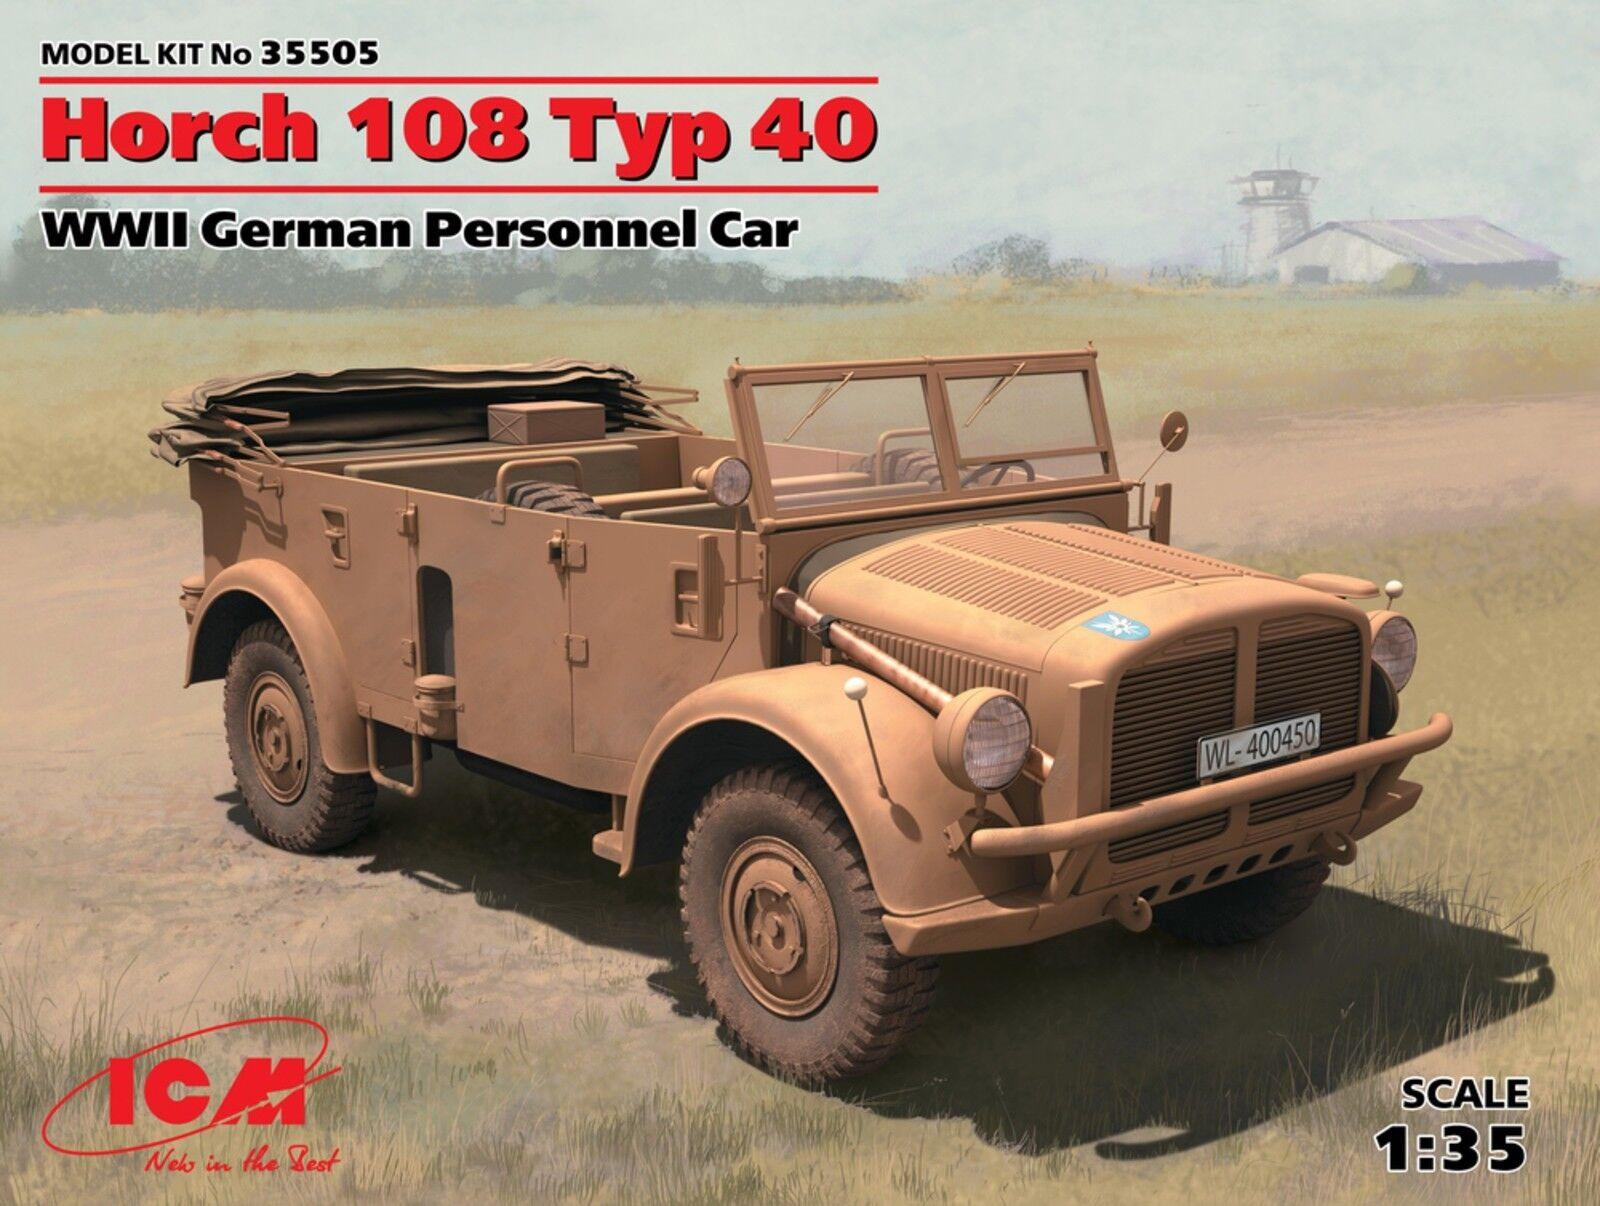 HORCH 108 TYP 40 (WEHRMACHT MARKINGS) 1 35 ICM